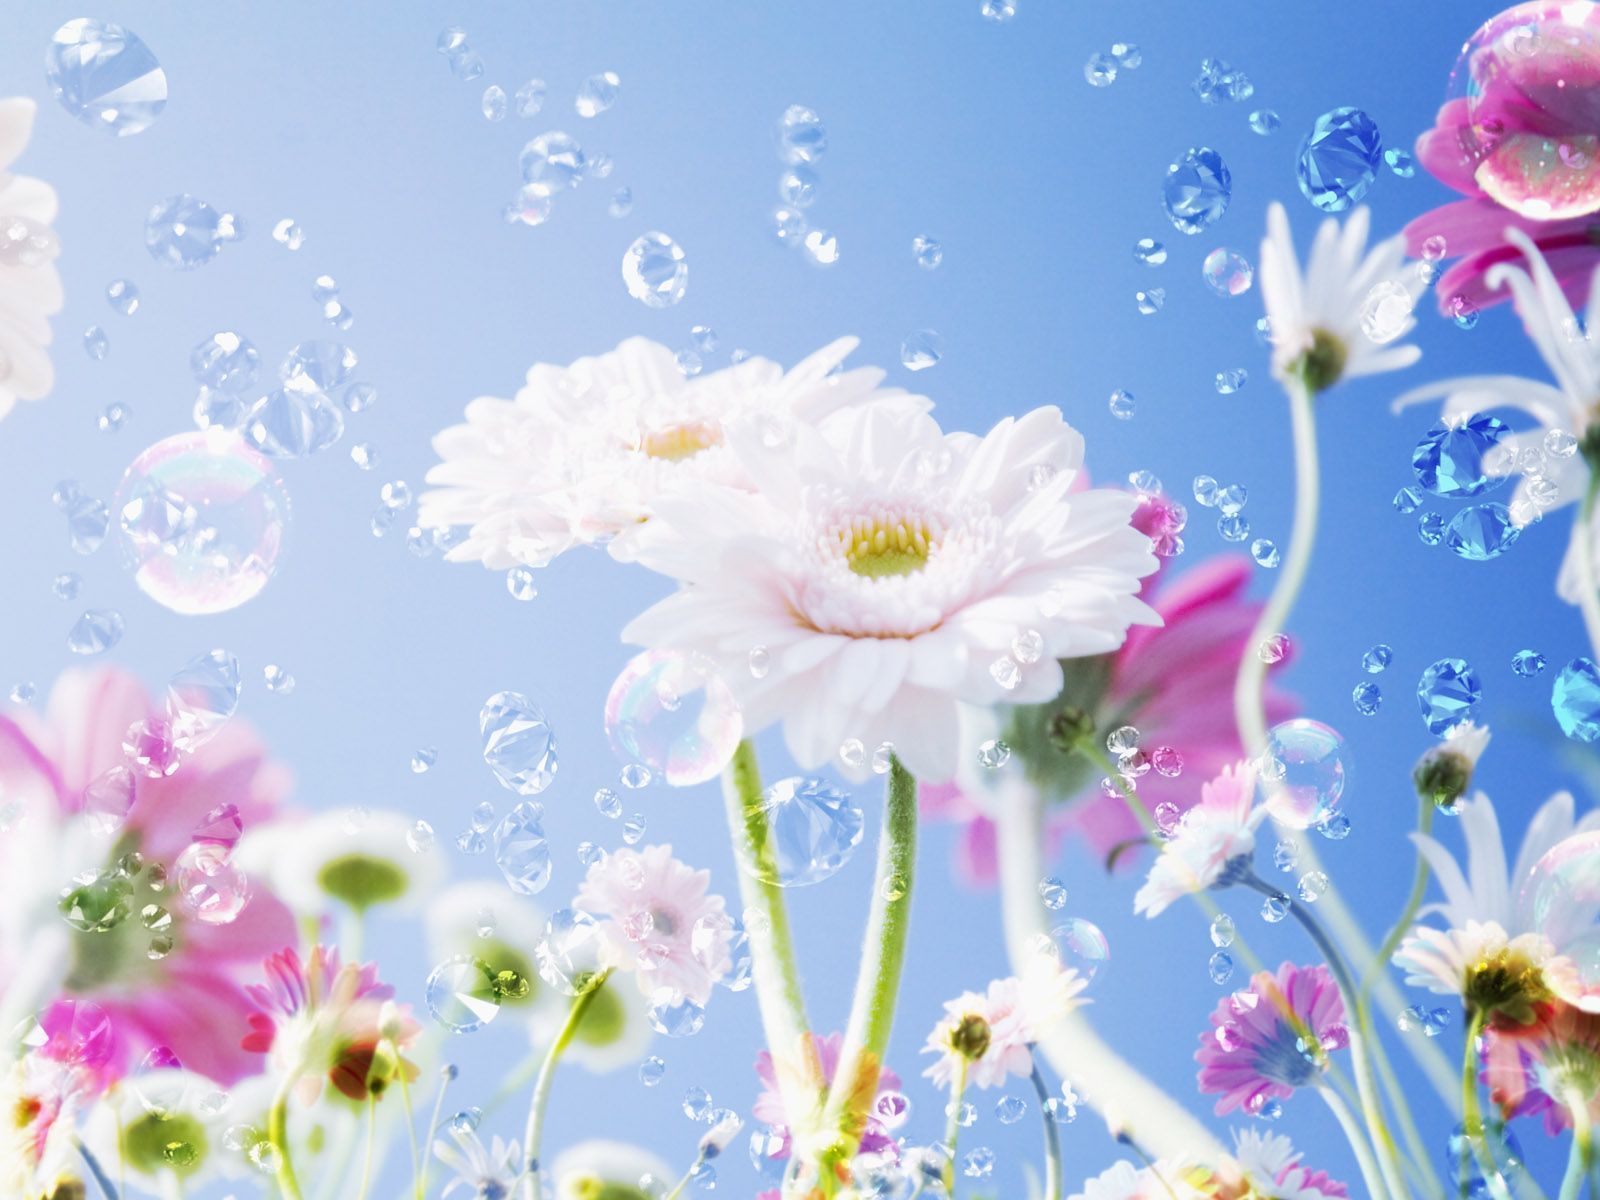 The most beautiful flower photo amazing photos amazing photo 1600x1200 izmirmasajfo Gallery